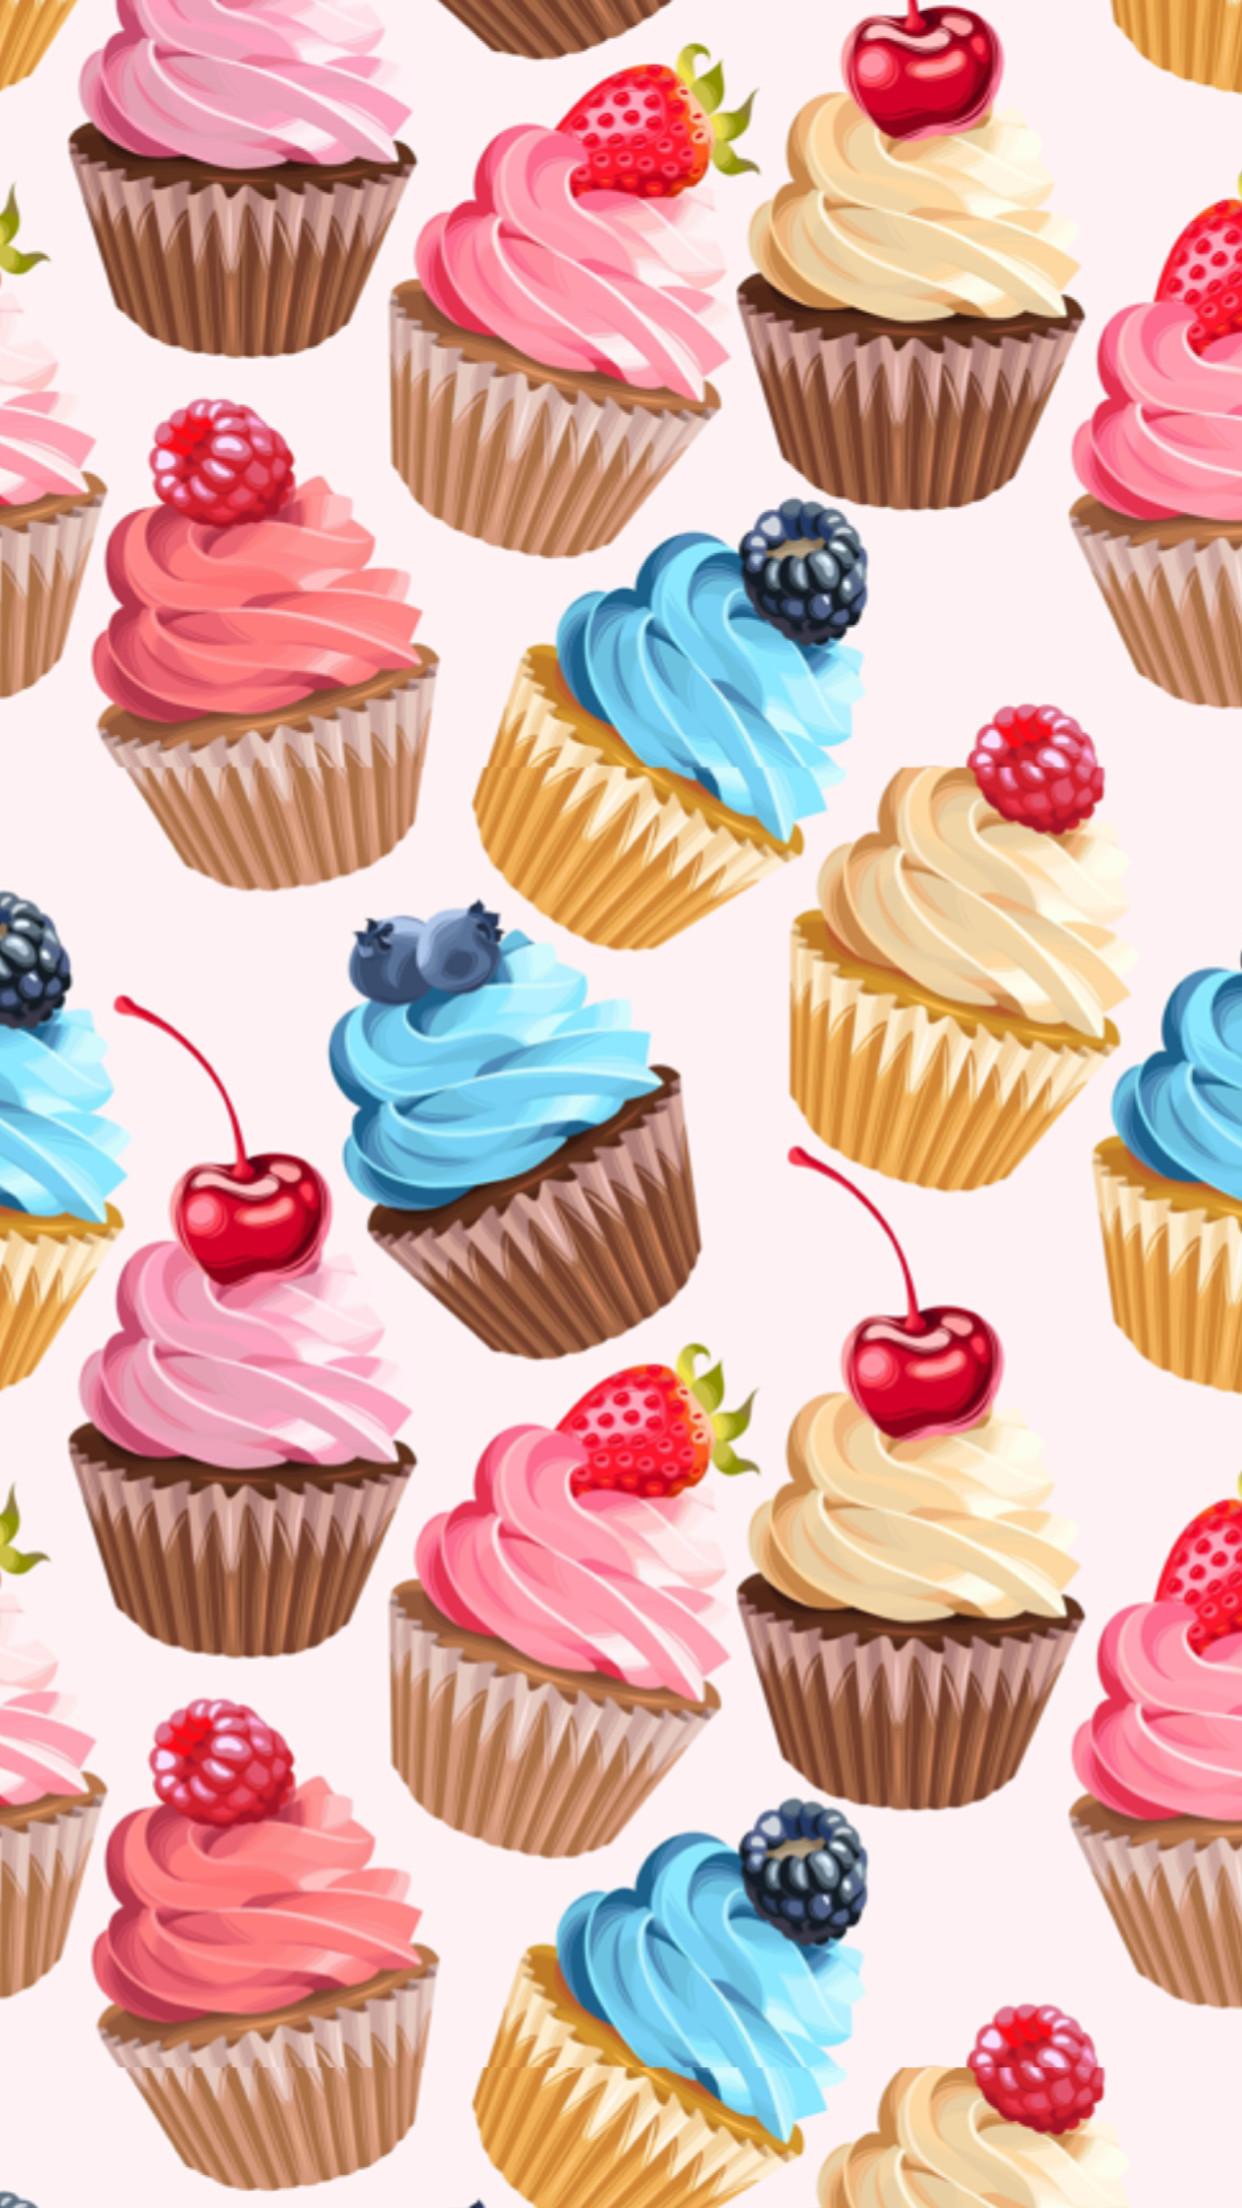 Res: 1242x2208, Kawaii art · Awesome cupcakes